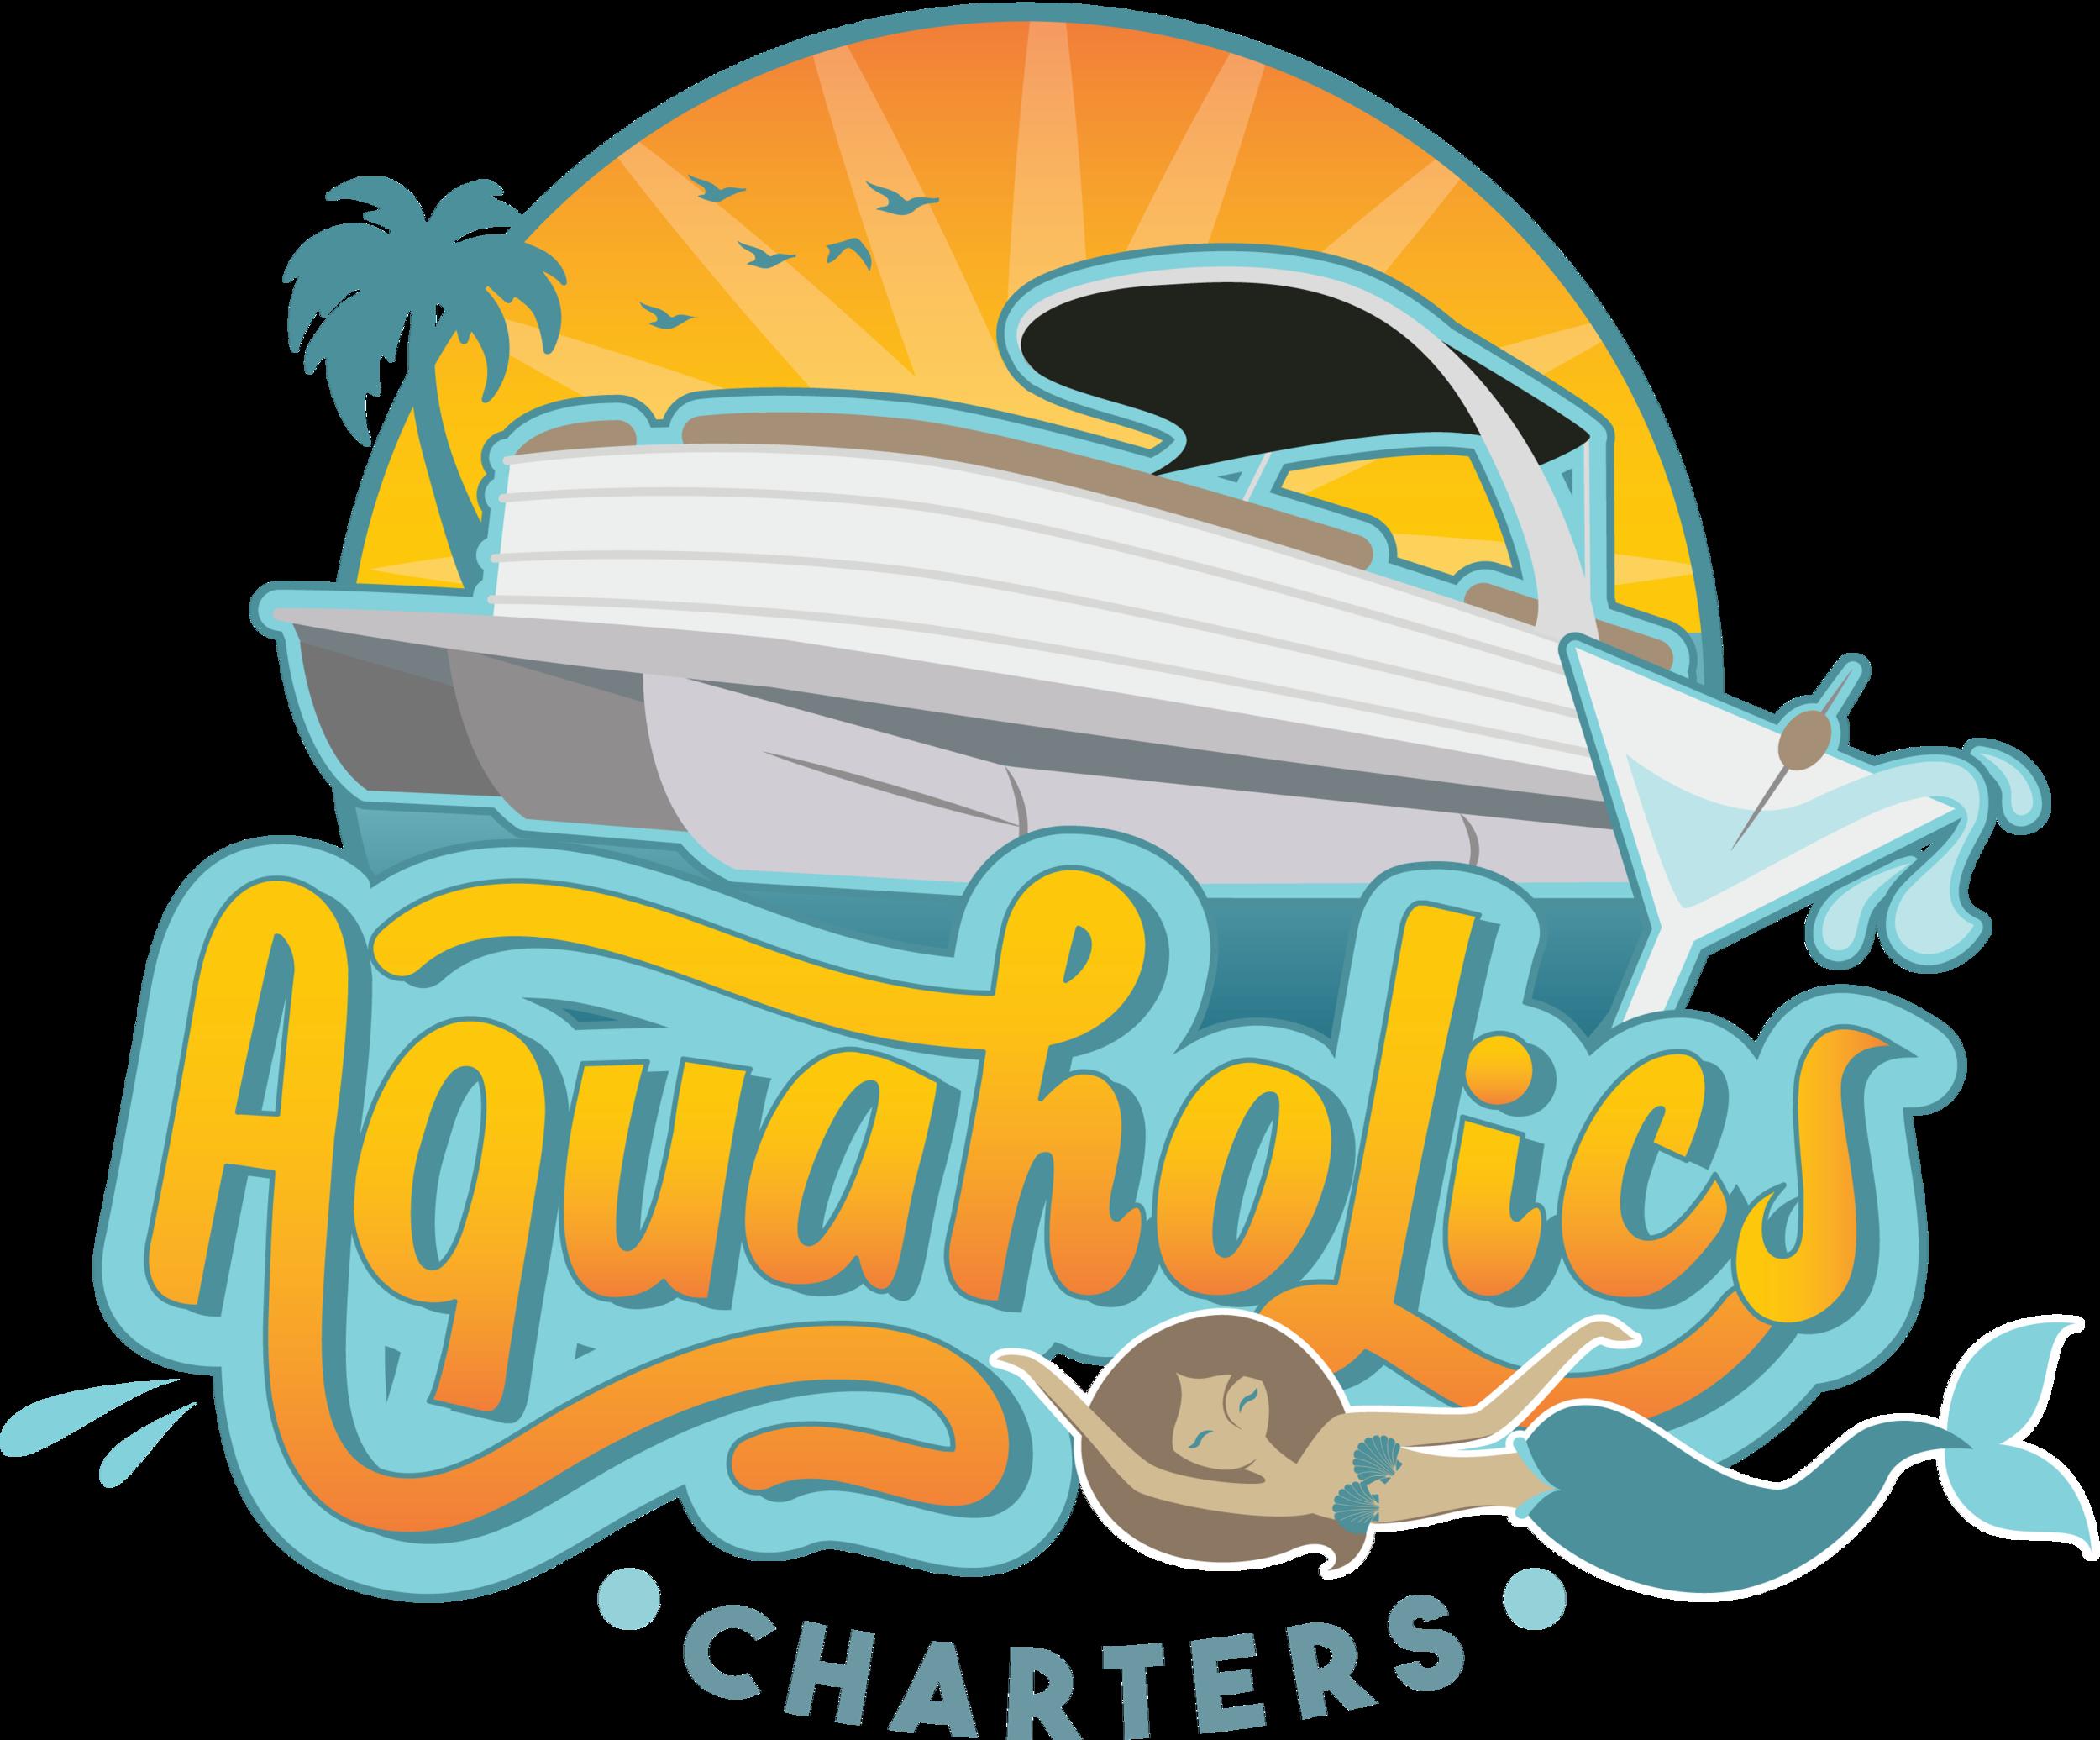 AquaholicsLogo_Full.png